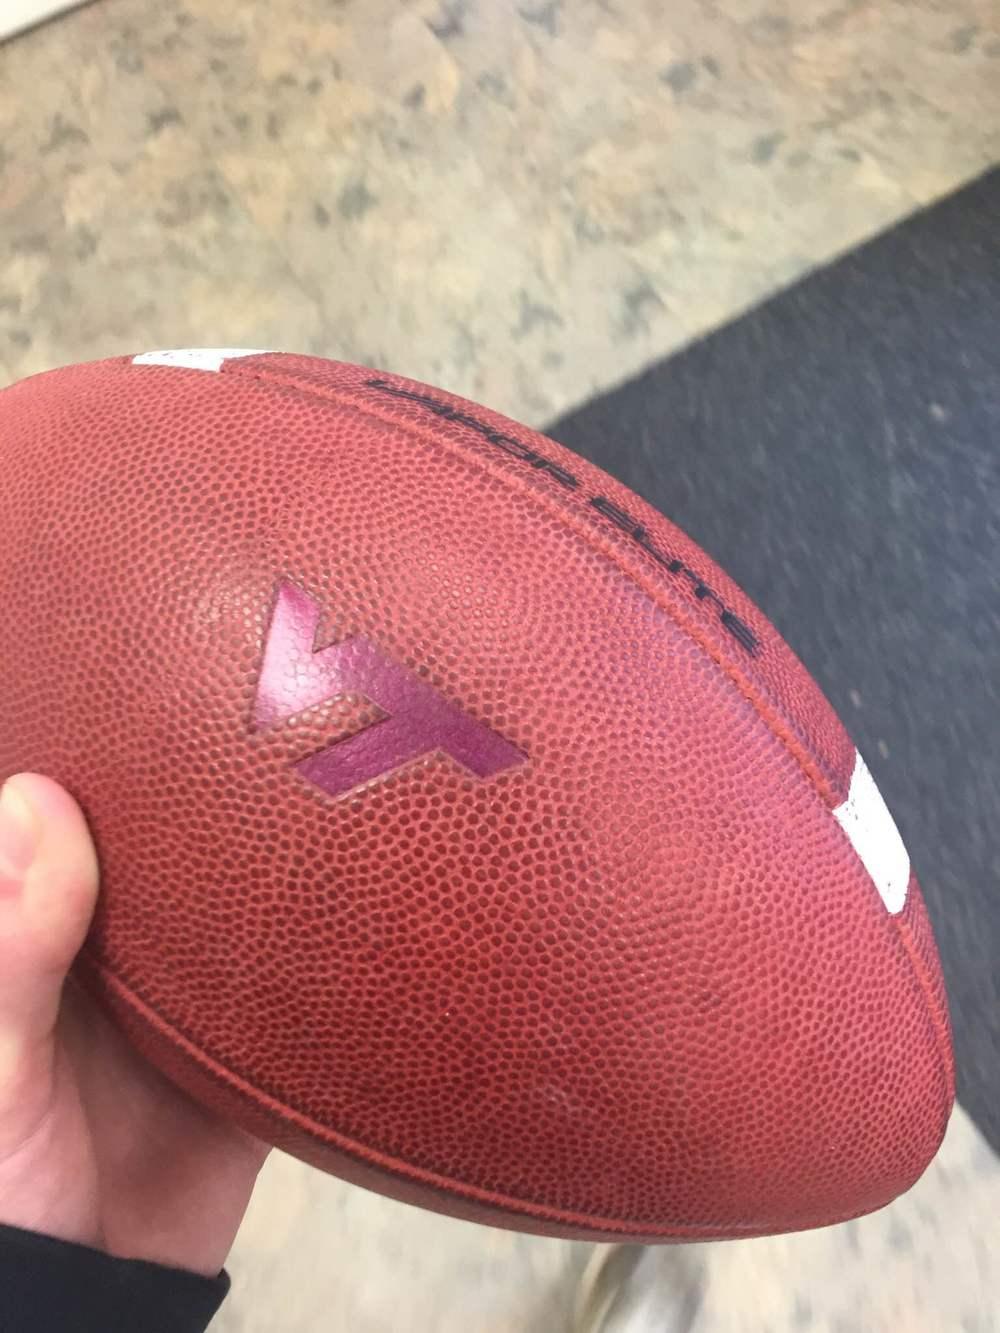 game ball.JPG